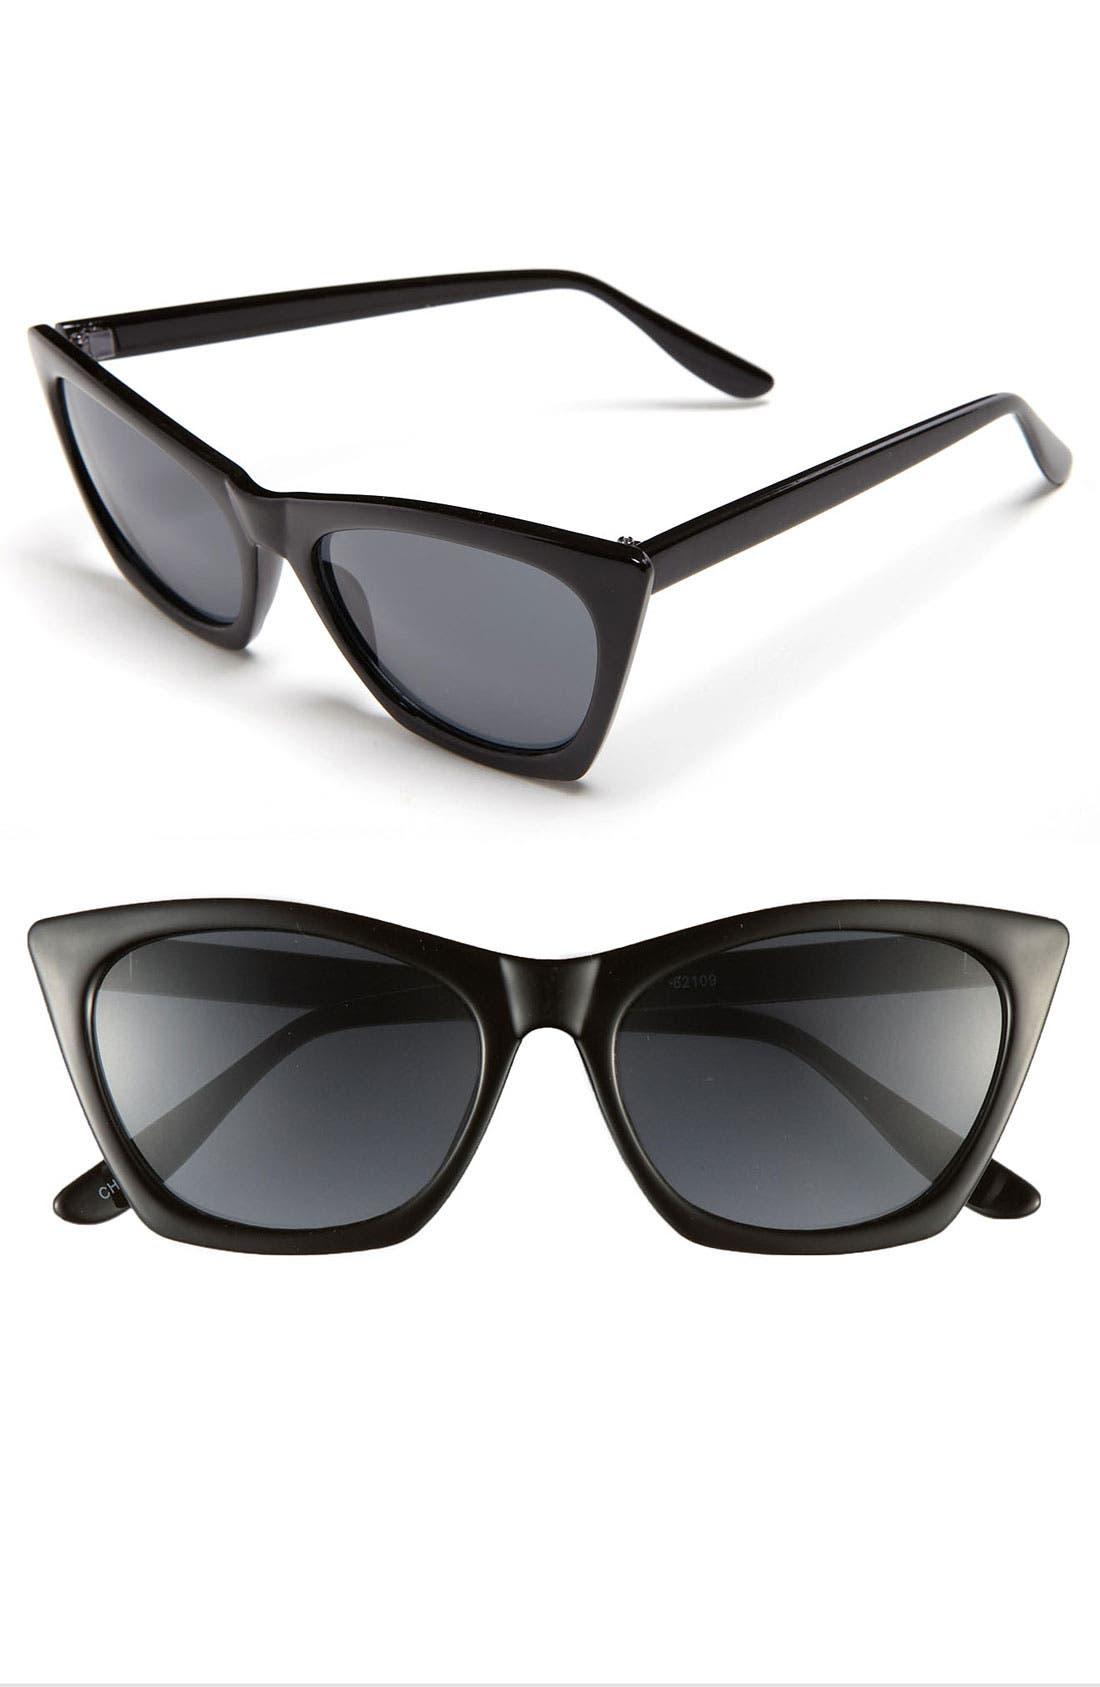 Alternate Image 1 Selected - A.J. Morgan 'Melanie' Sunglasses